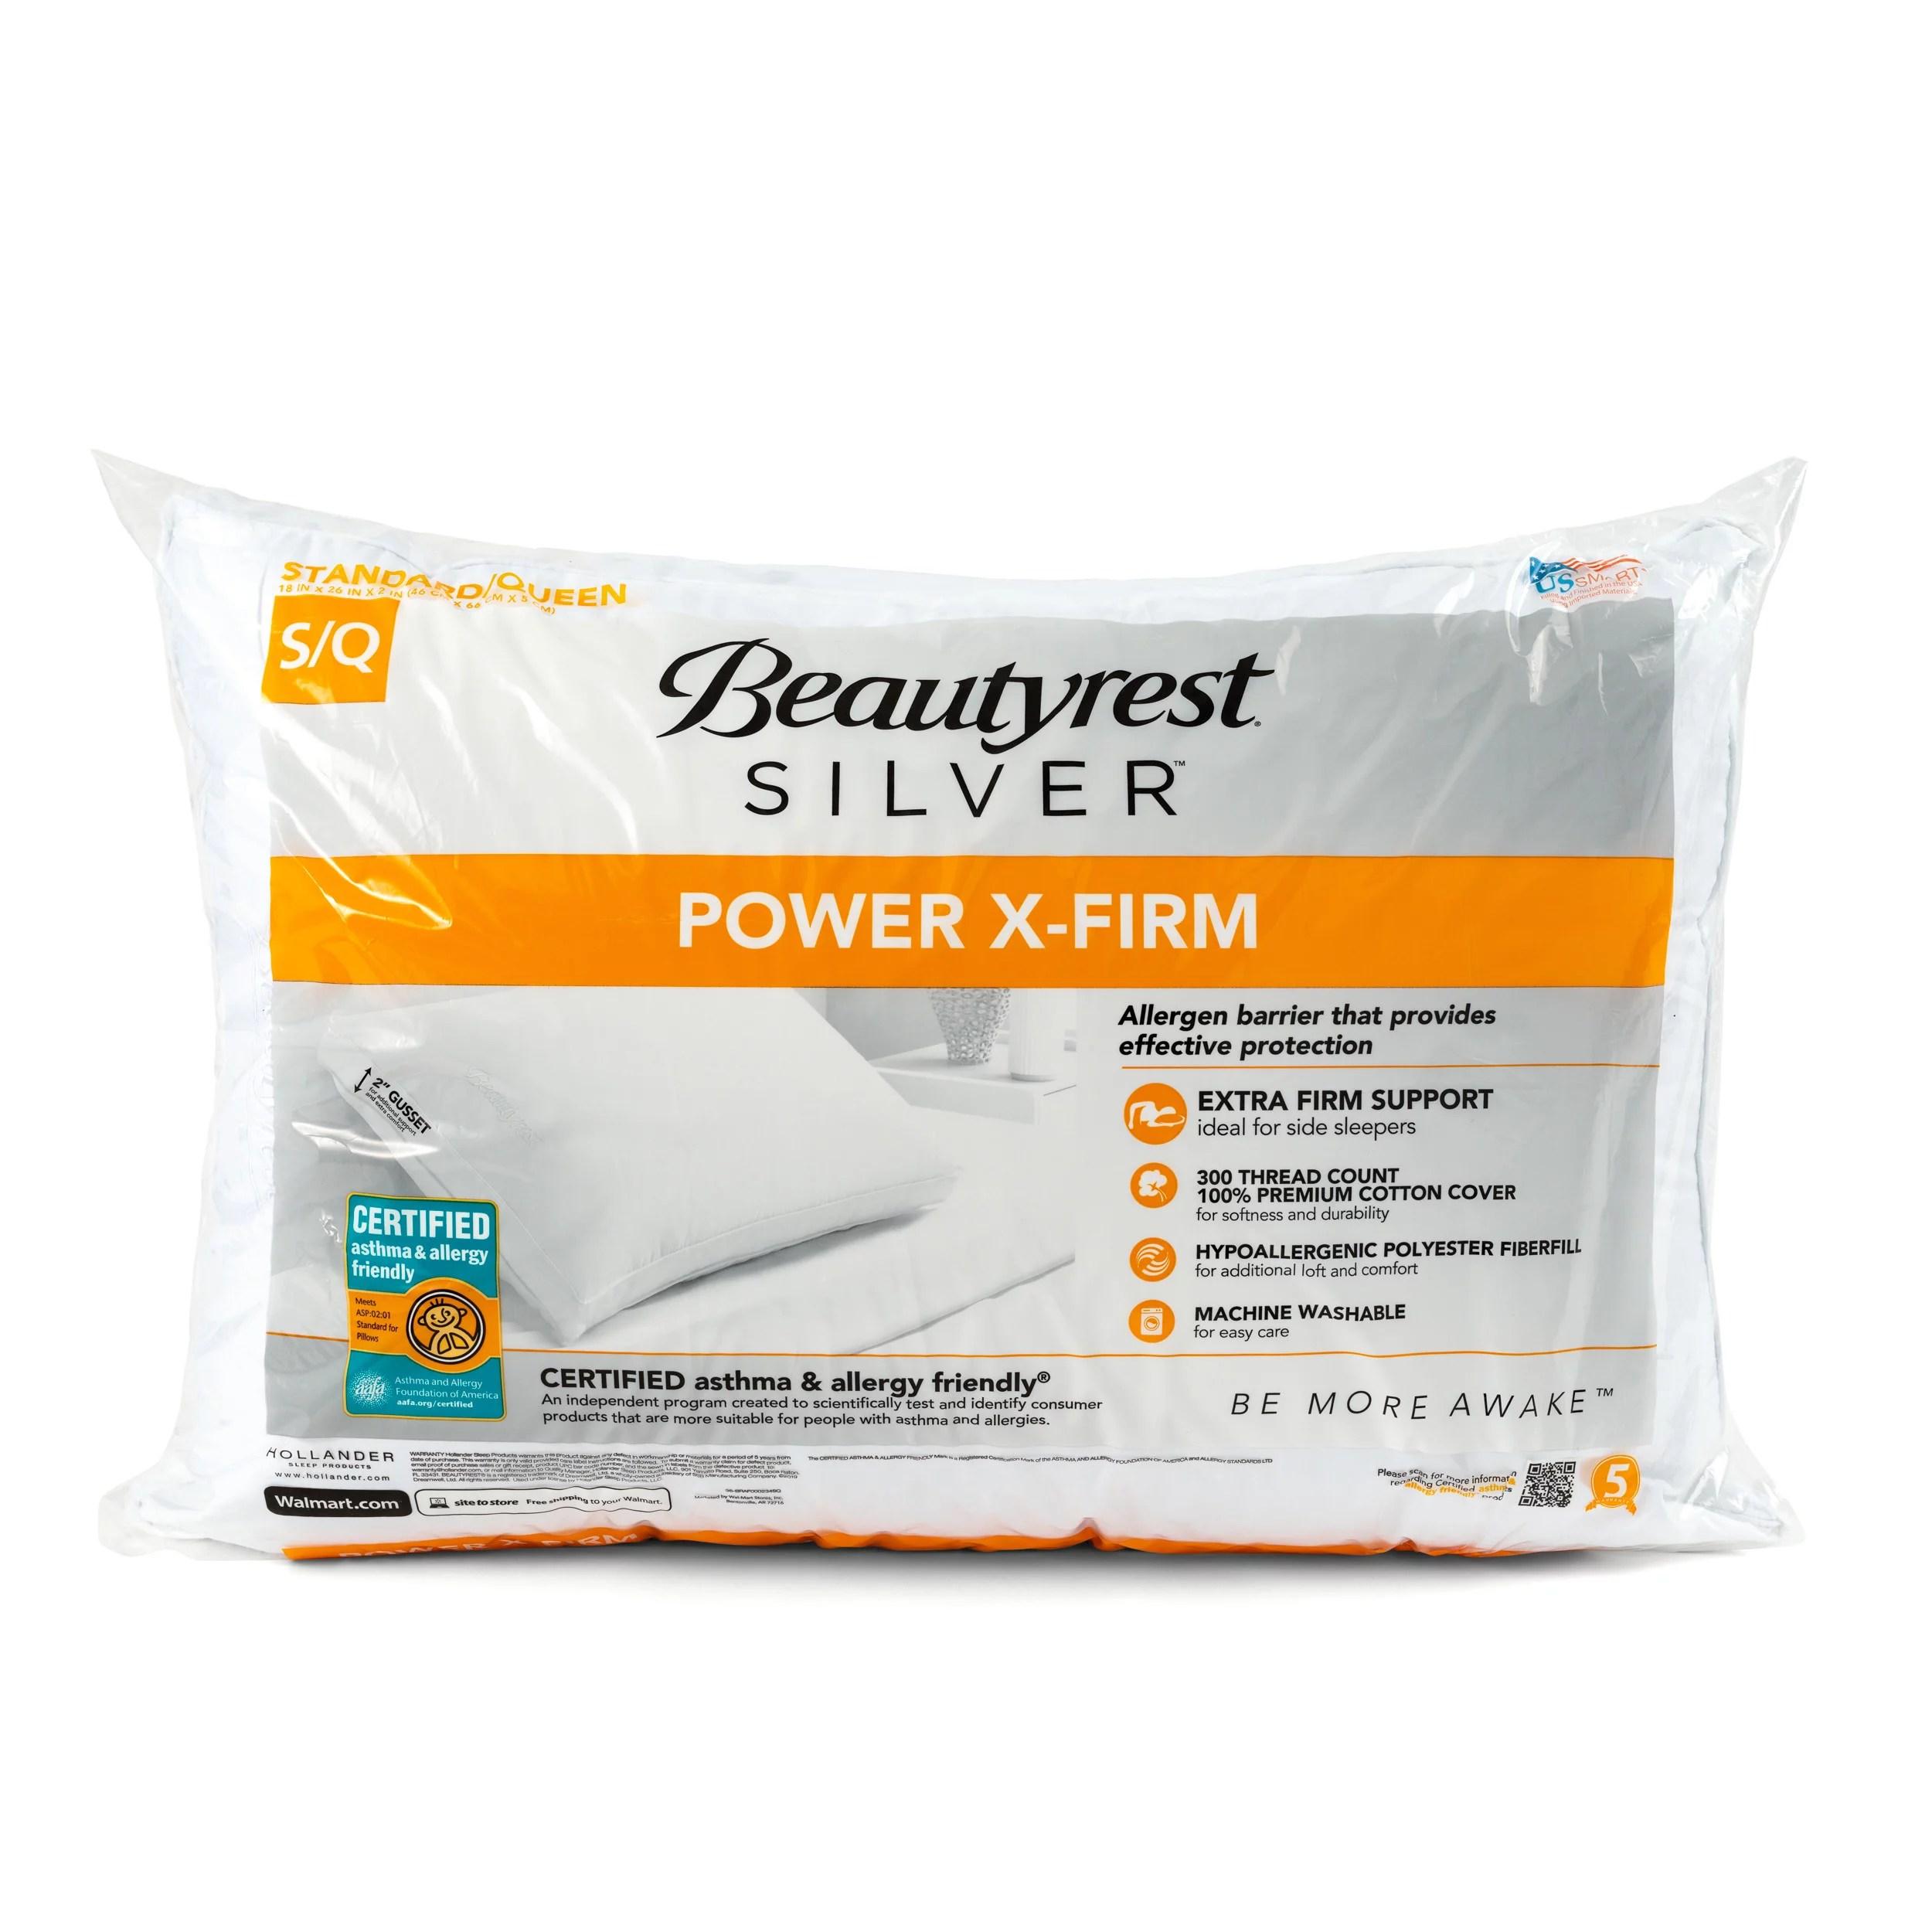 beautyrest silver power xfirm asthma allergy pillow multiple sizes